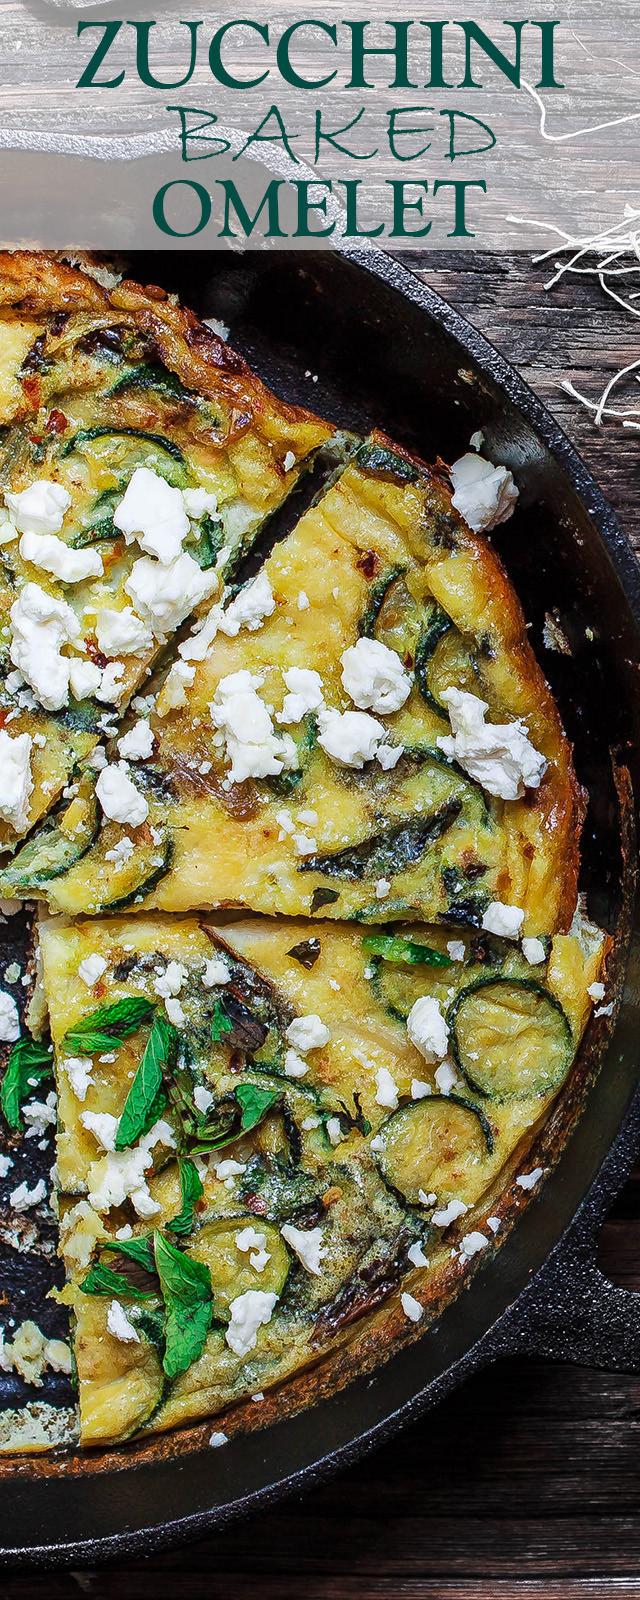 Middle Eastern Breakfast Recipes 20 Best Ideas Middle Eastern Zucchini Baked Omelet Eggah Bi Kousa